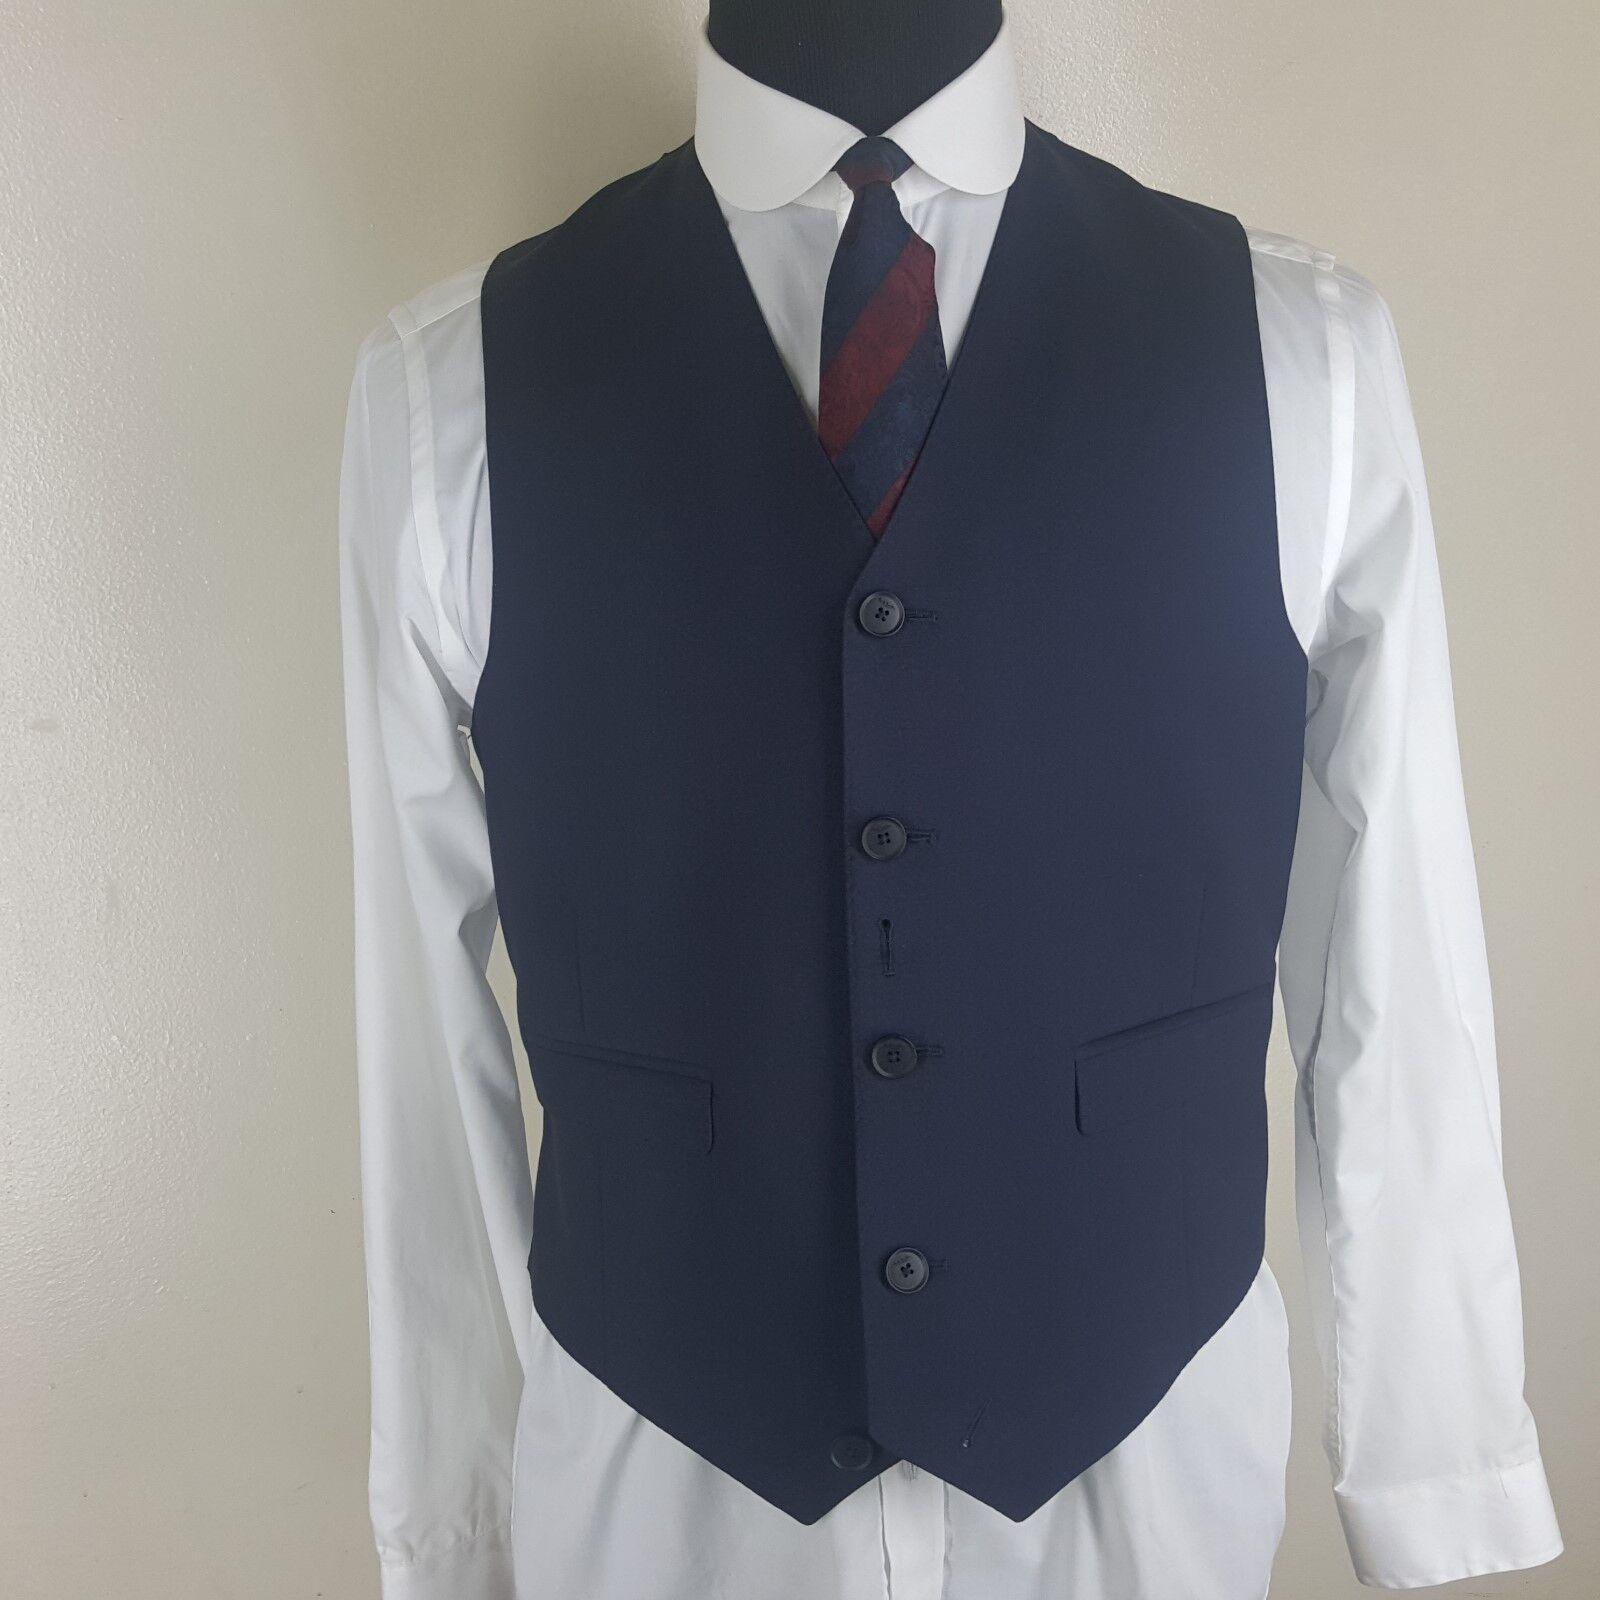 9f5efddb1 PAUL New Rare Recent Dark Blau 5 Btn Wool & Mohair Vest 40 Reg SMITH ...